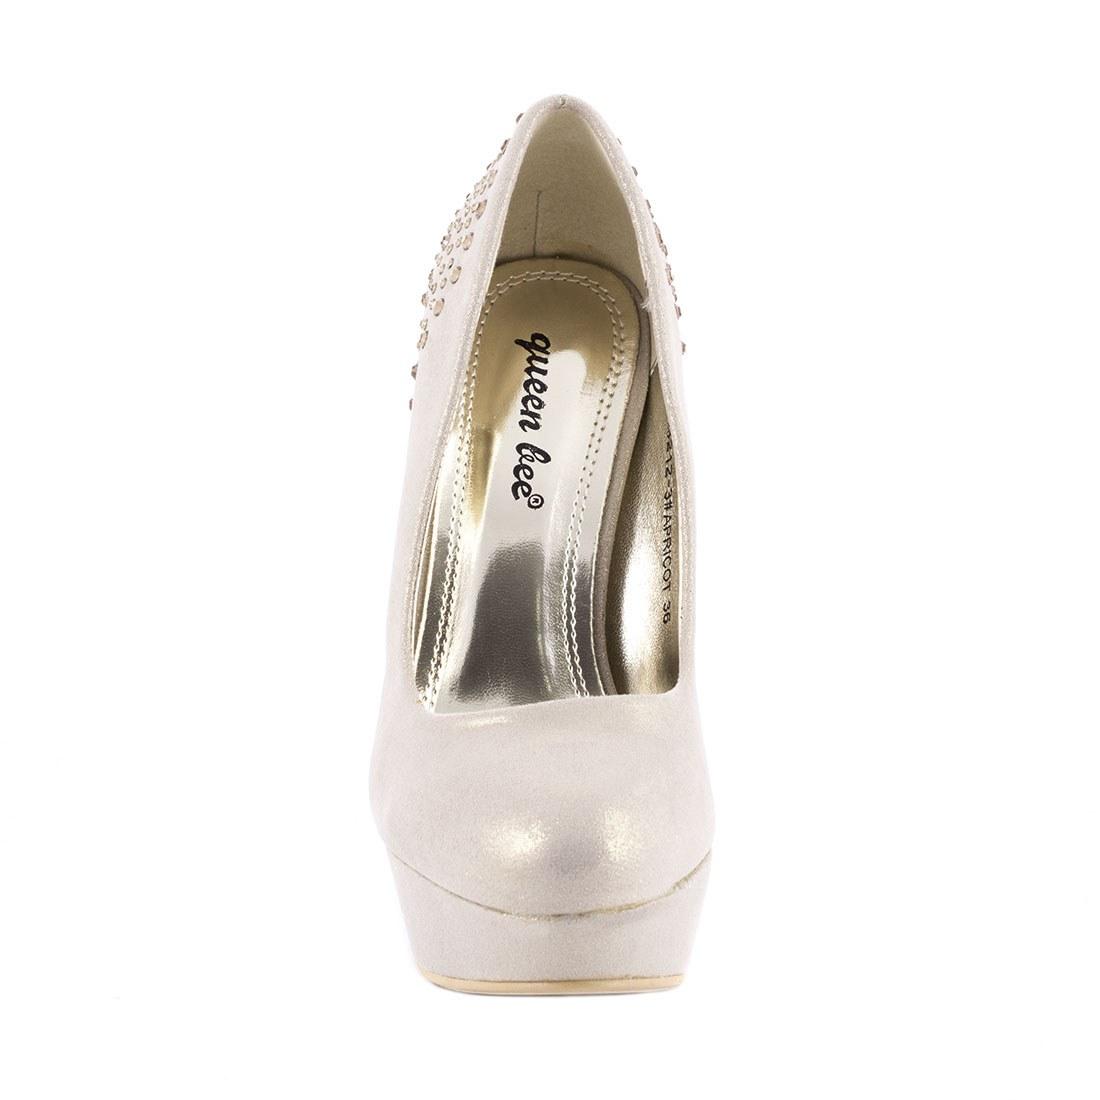 Pantofi dama cu toc M3212-3APRICOT